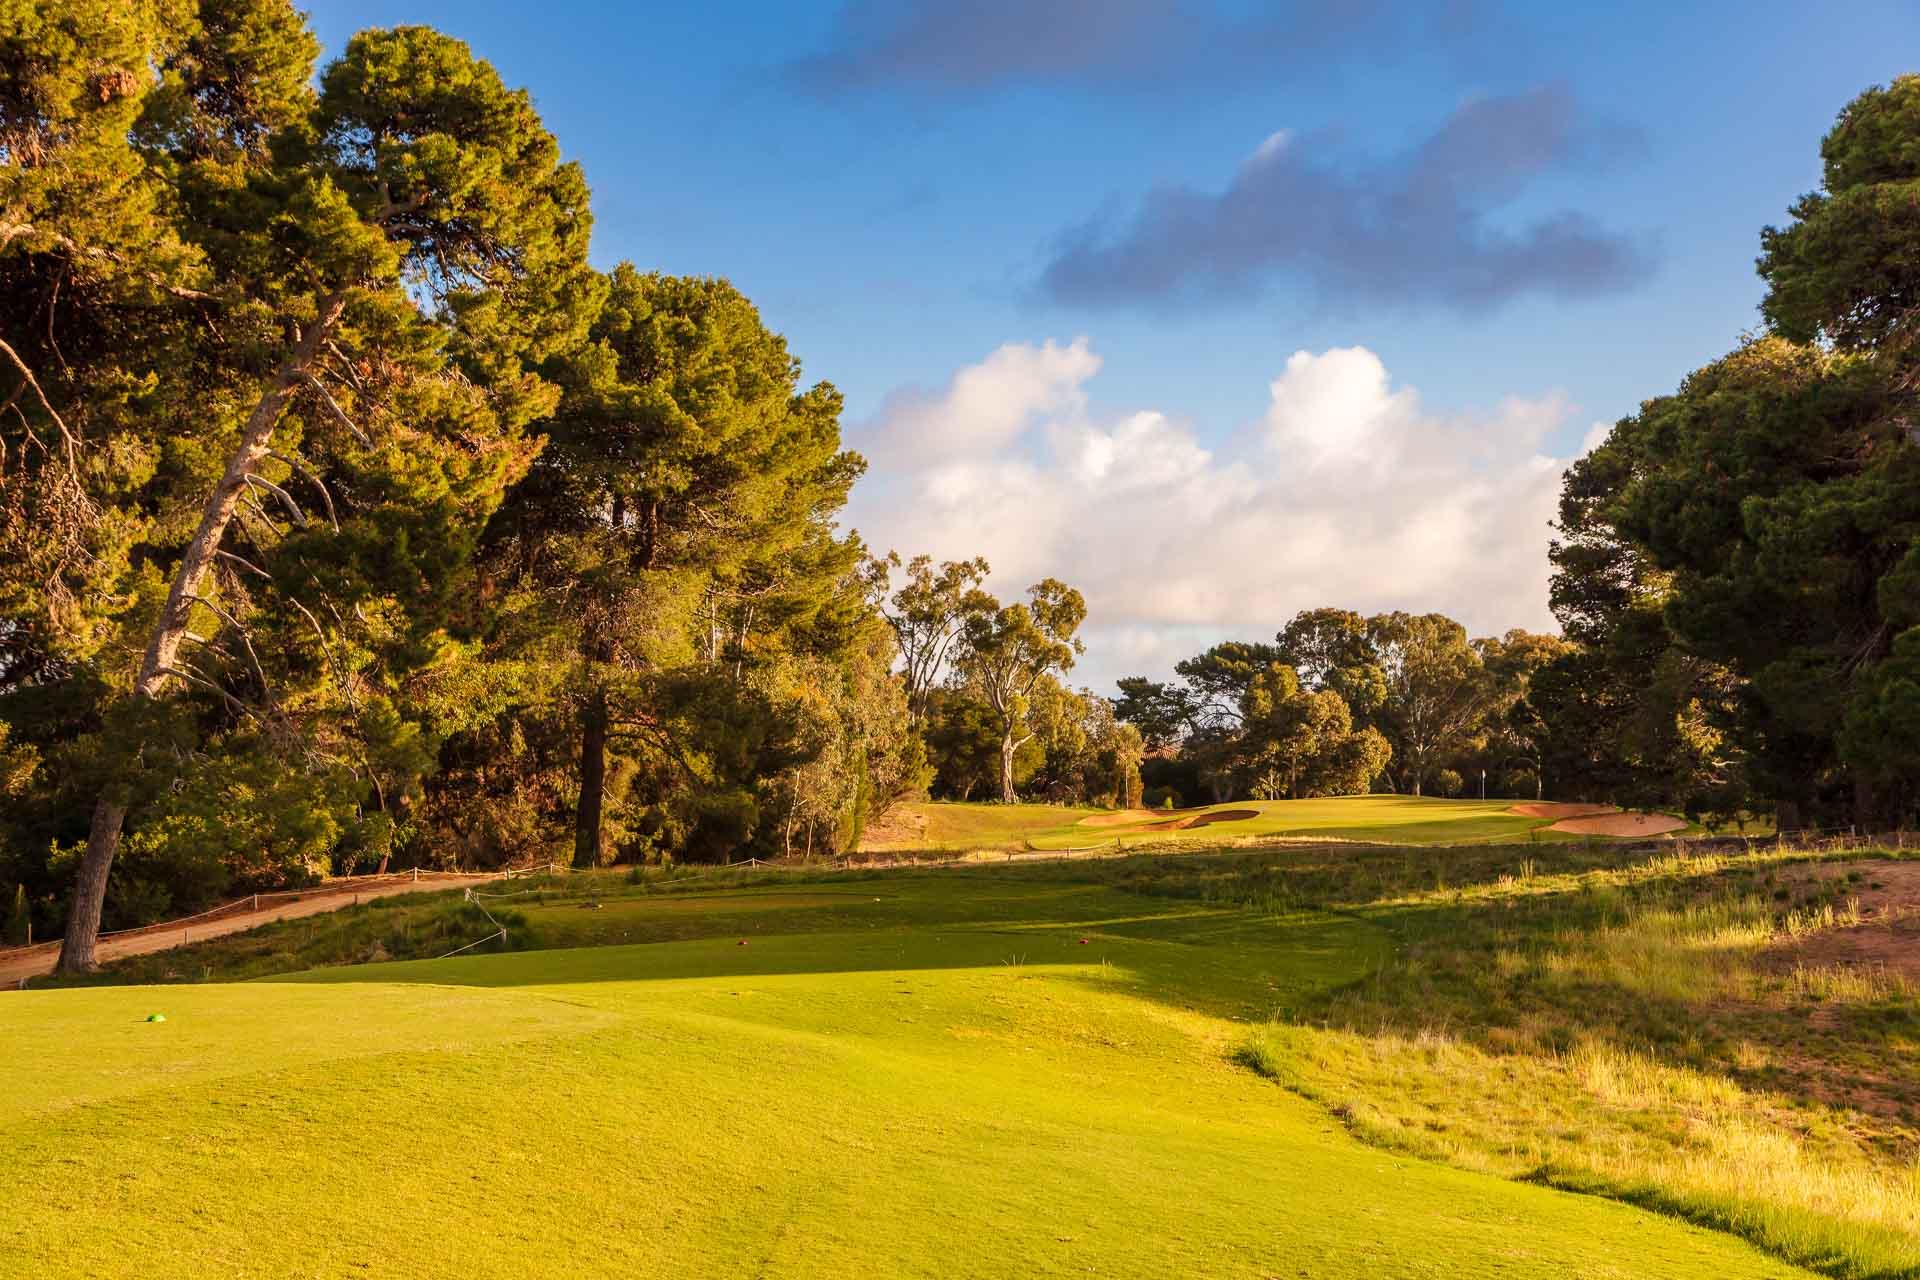 Kooyonga Golf Club - Par 3, 15th Hole / Photo: David Brand